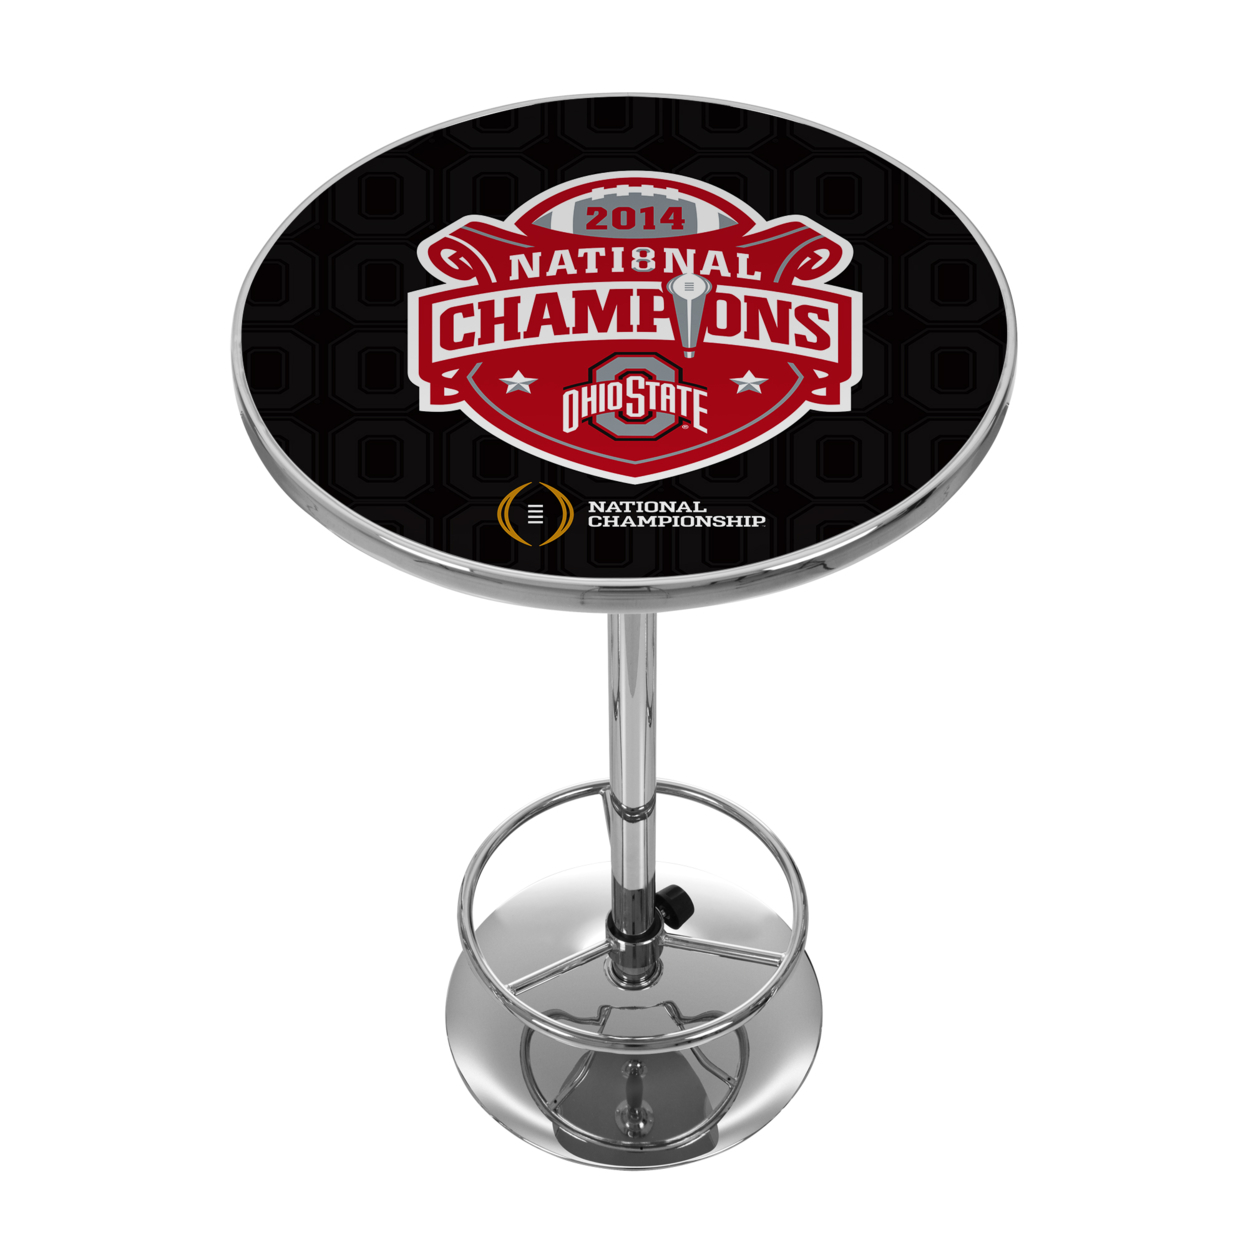 Ohio State University National Champions Chrome 42 Inch Pub Table - Fade winesburg ohio